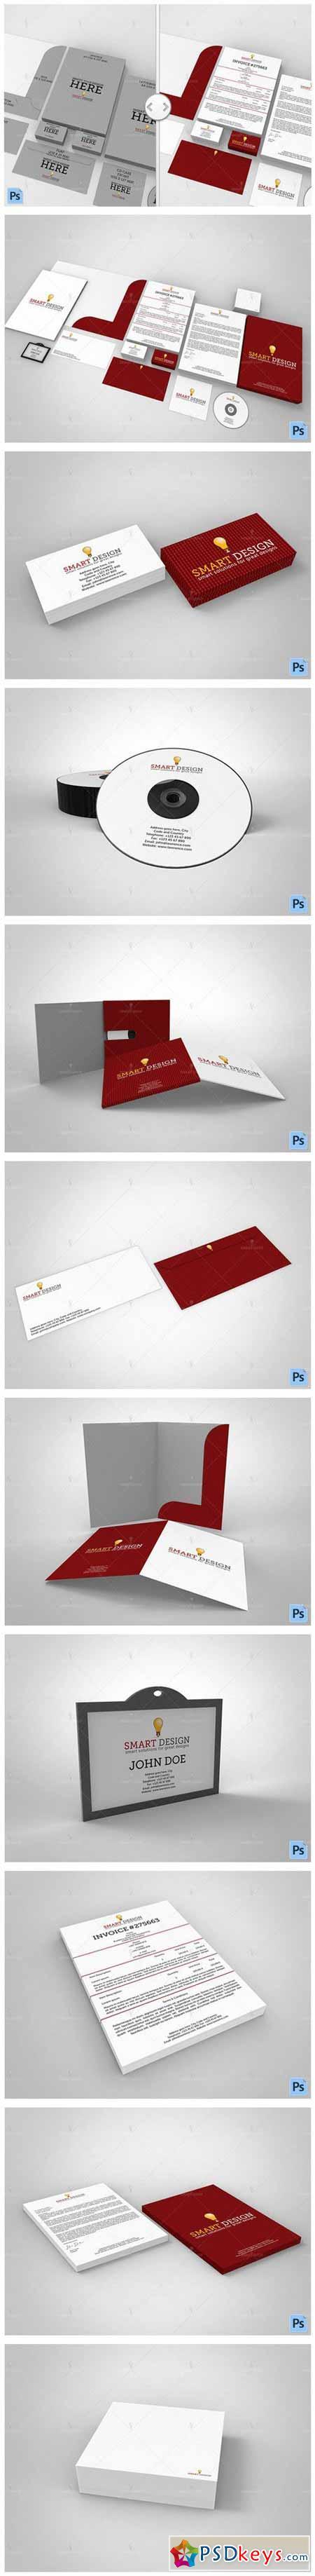 Branding Stationary Mockup Set 576112